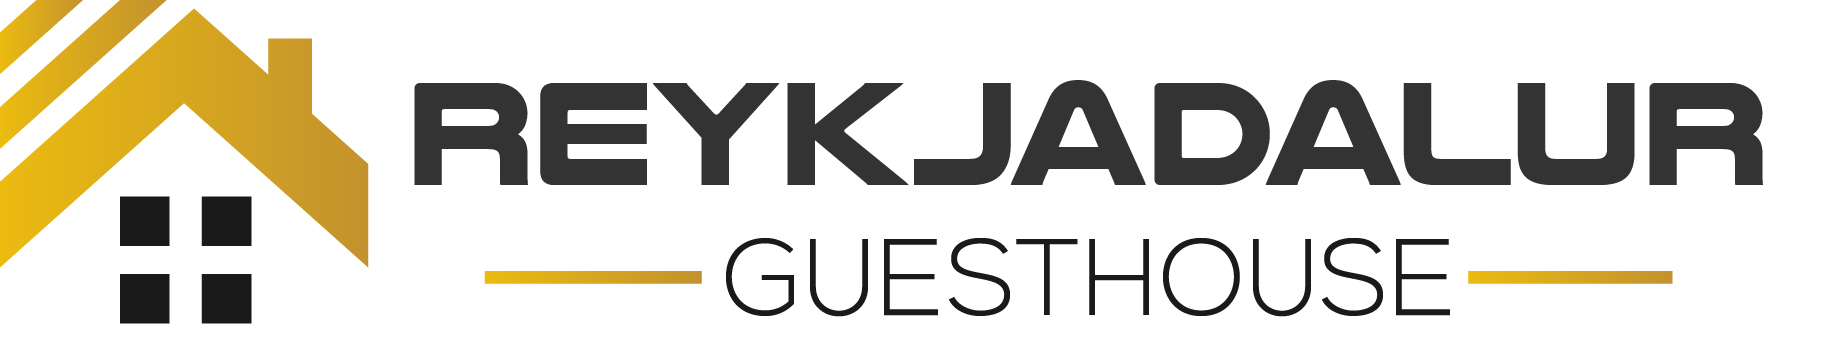 Reykjadalur Guesthouse